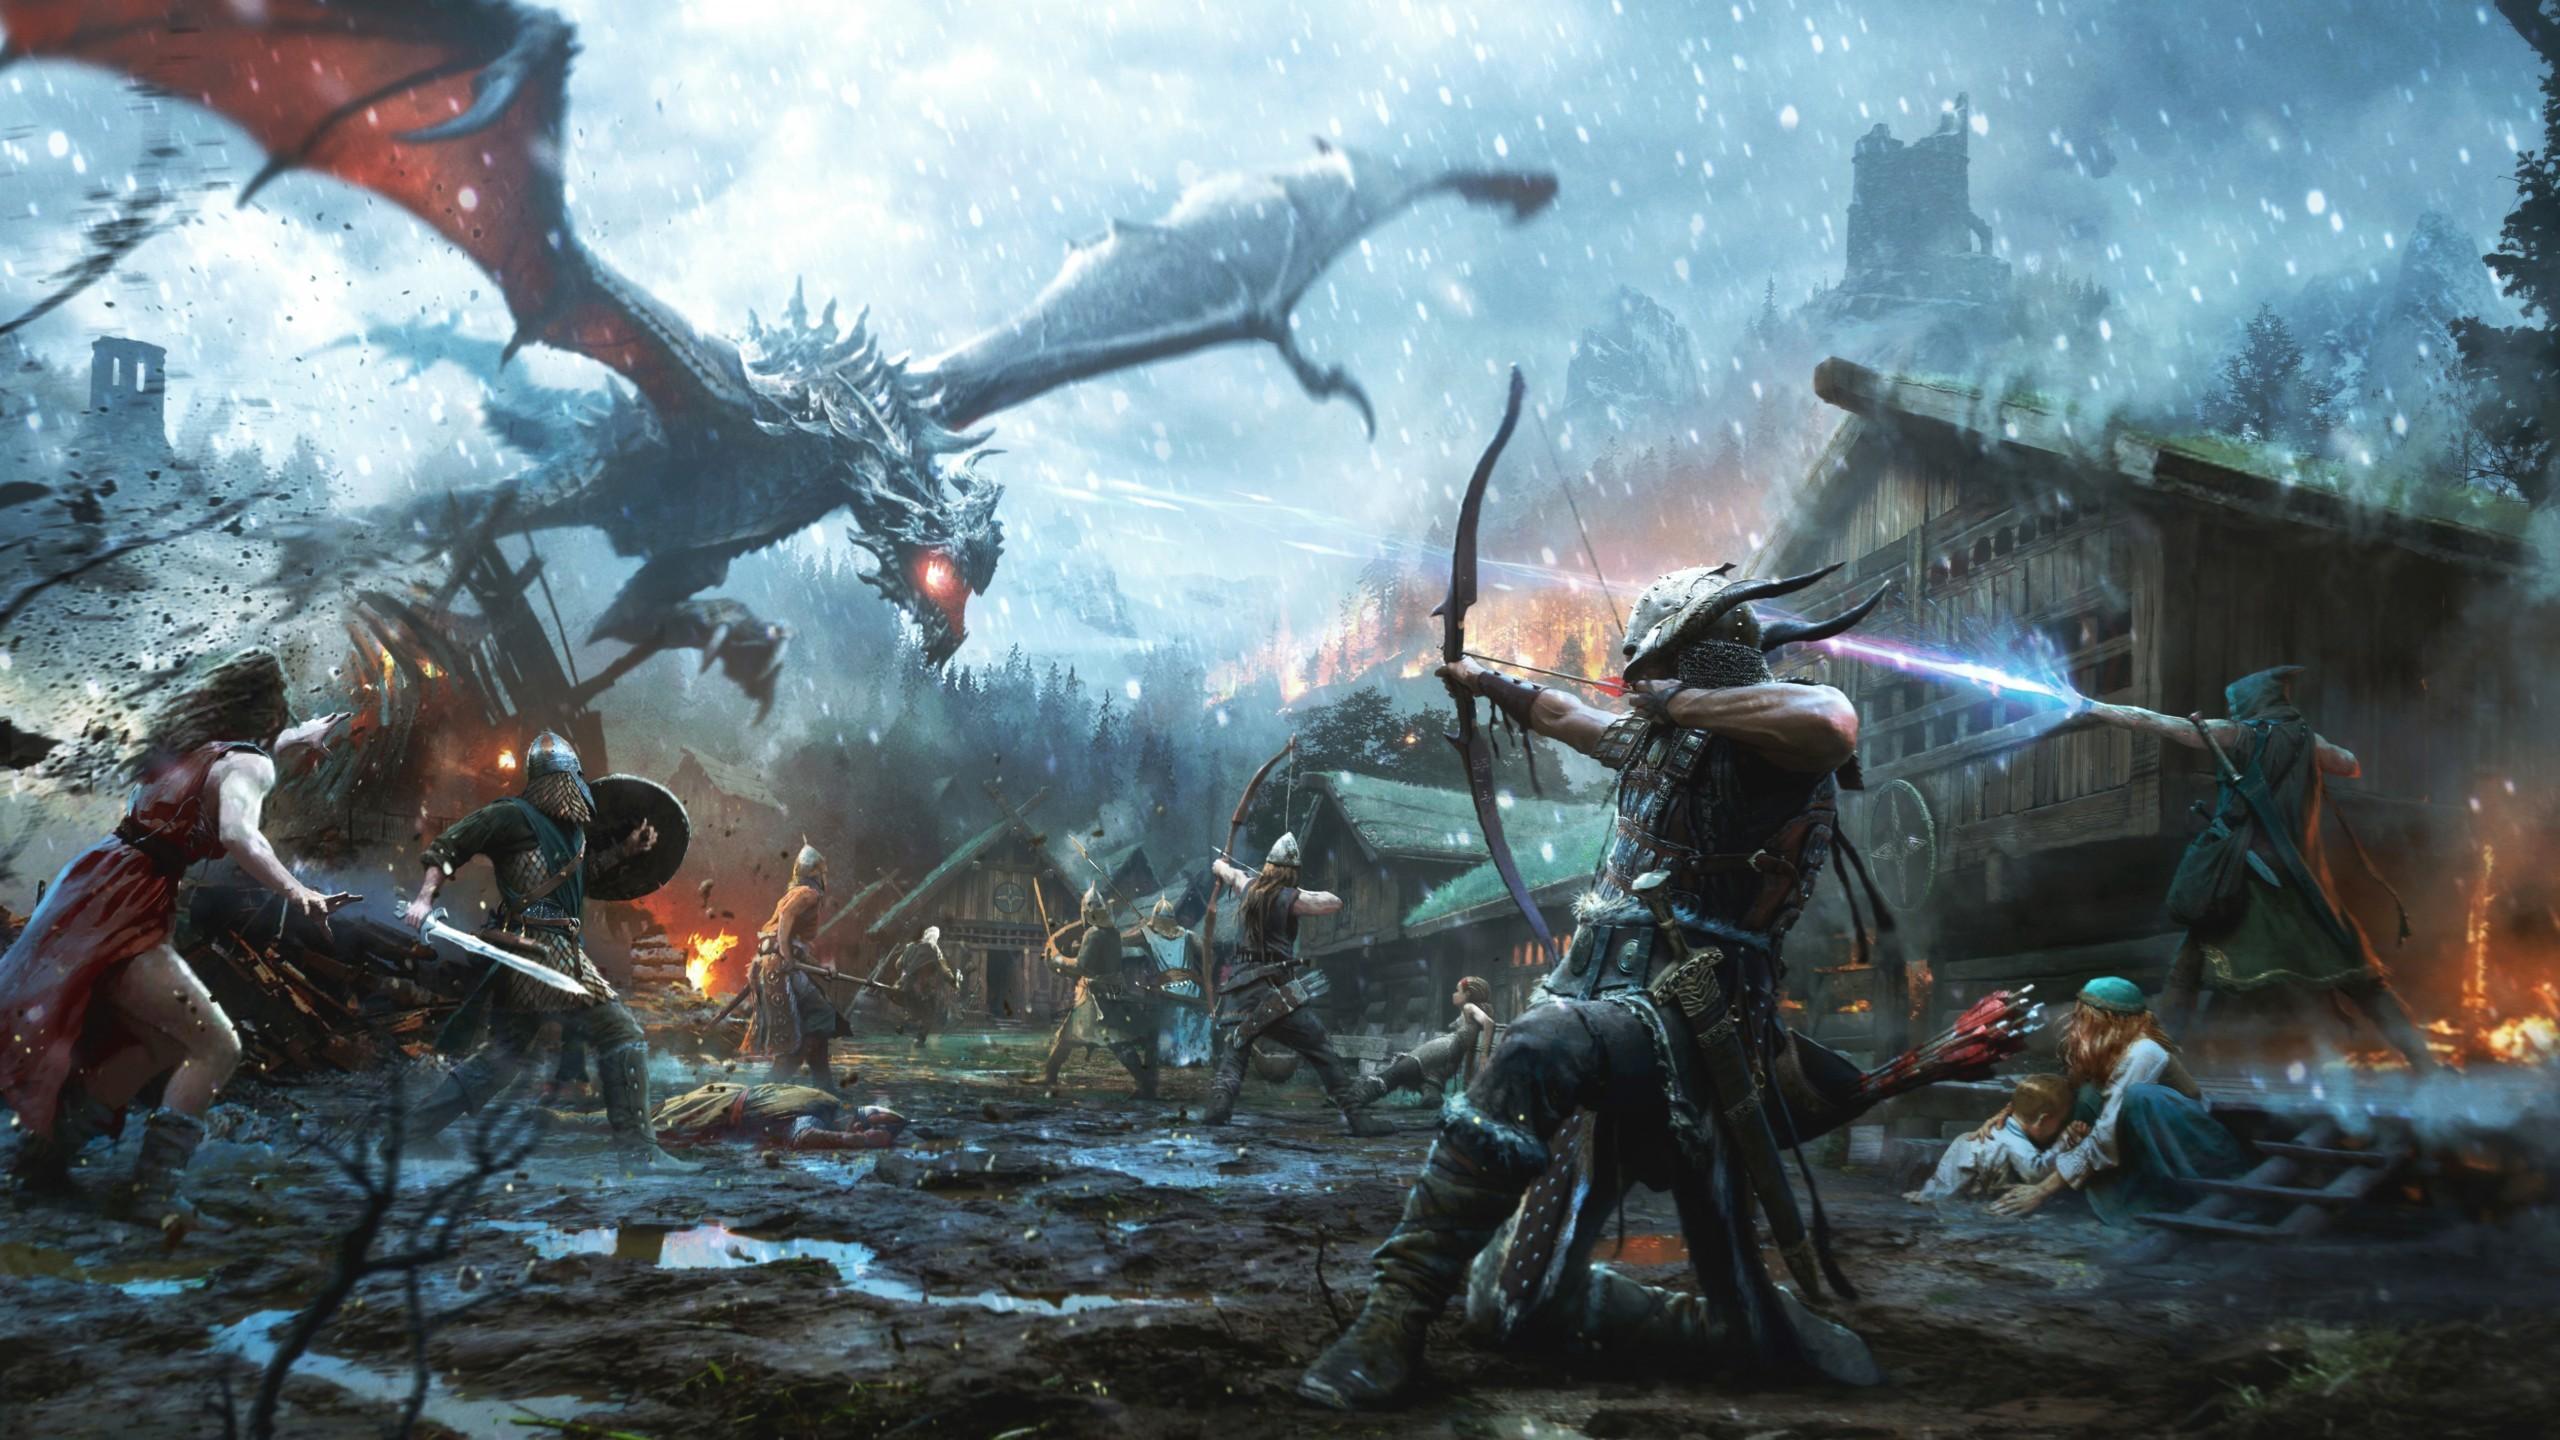 Games / The Elder Scrolls: Legends Wallpaper